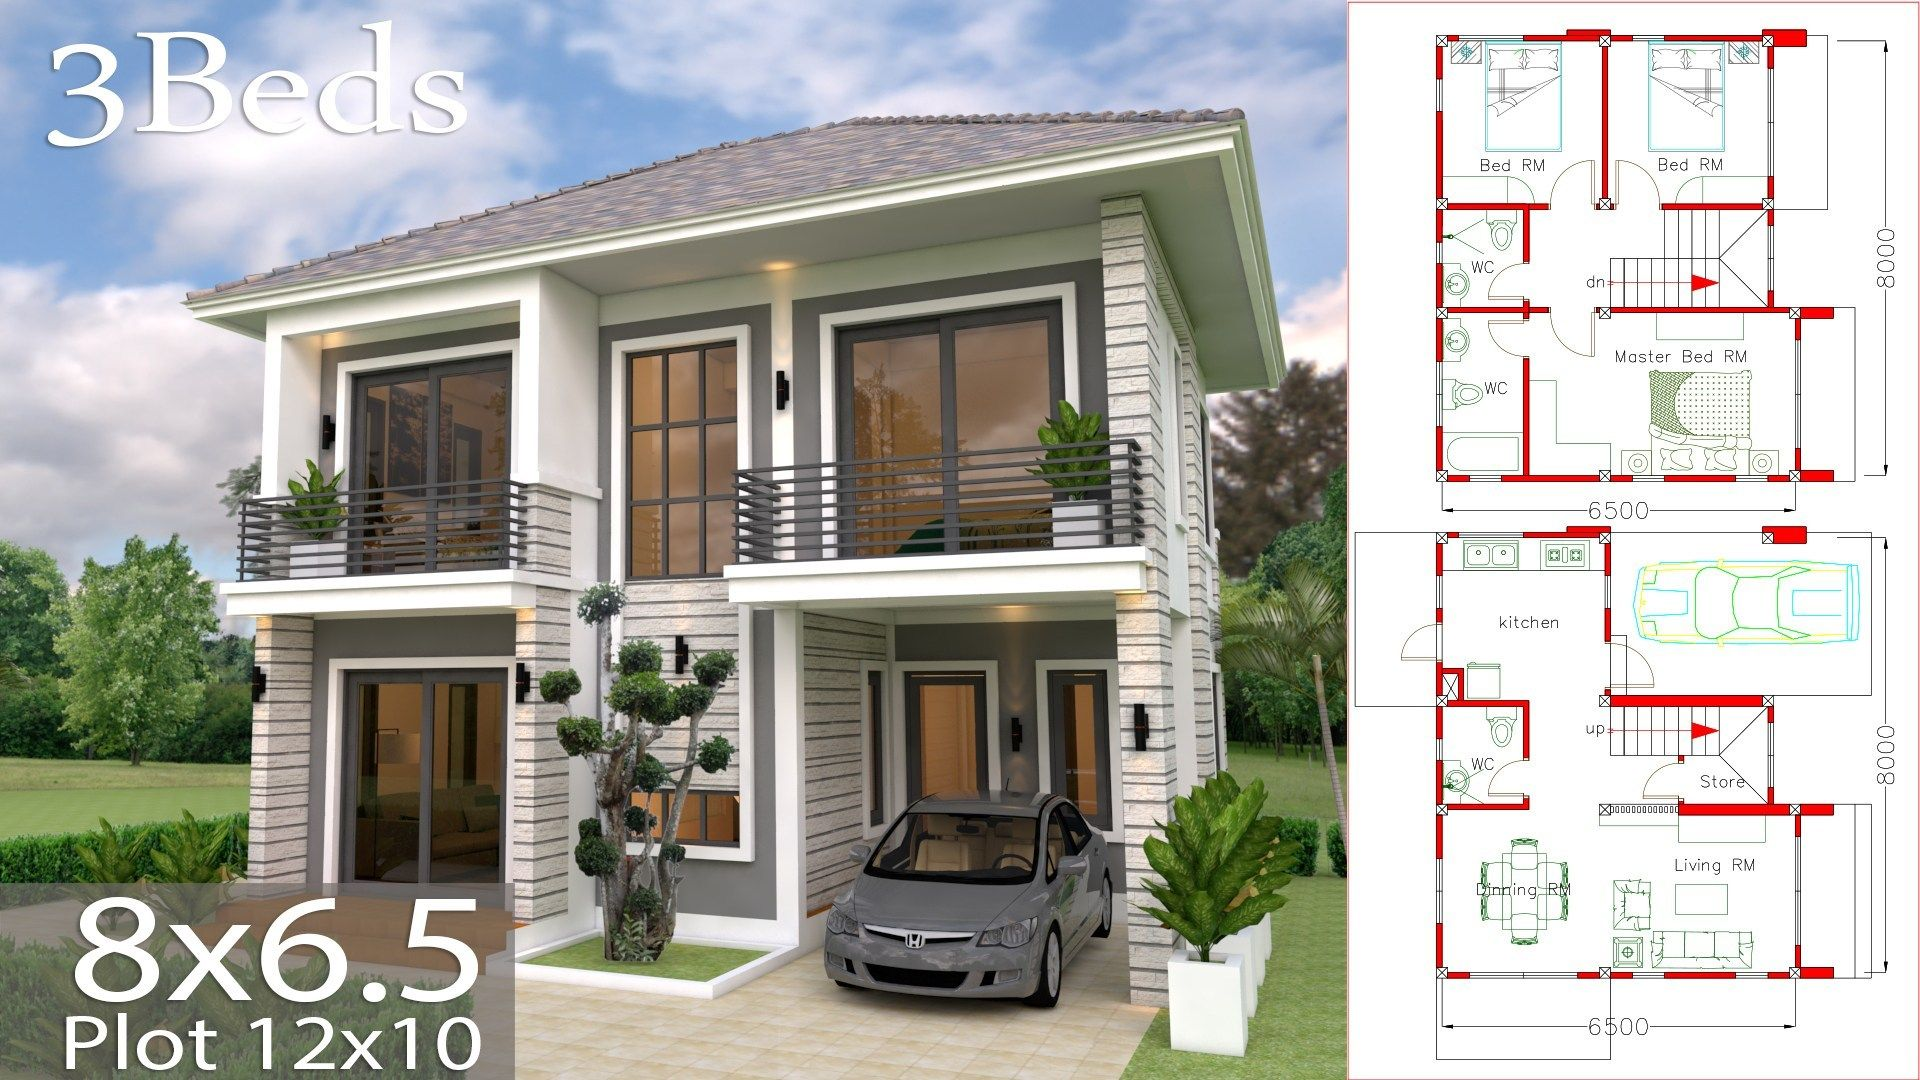 Home Design Plan 8x6 5m With 3 Bedrooms Samphoas Com Architectural House Plans Home Design Plan Simple House Design